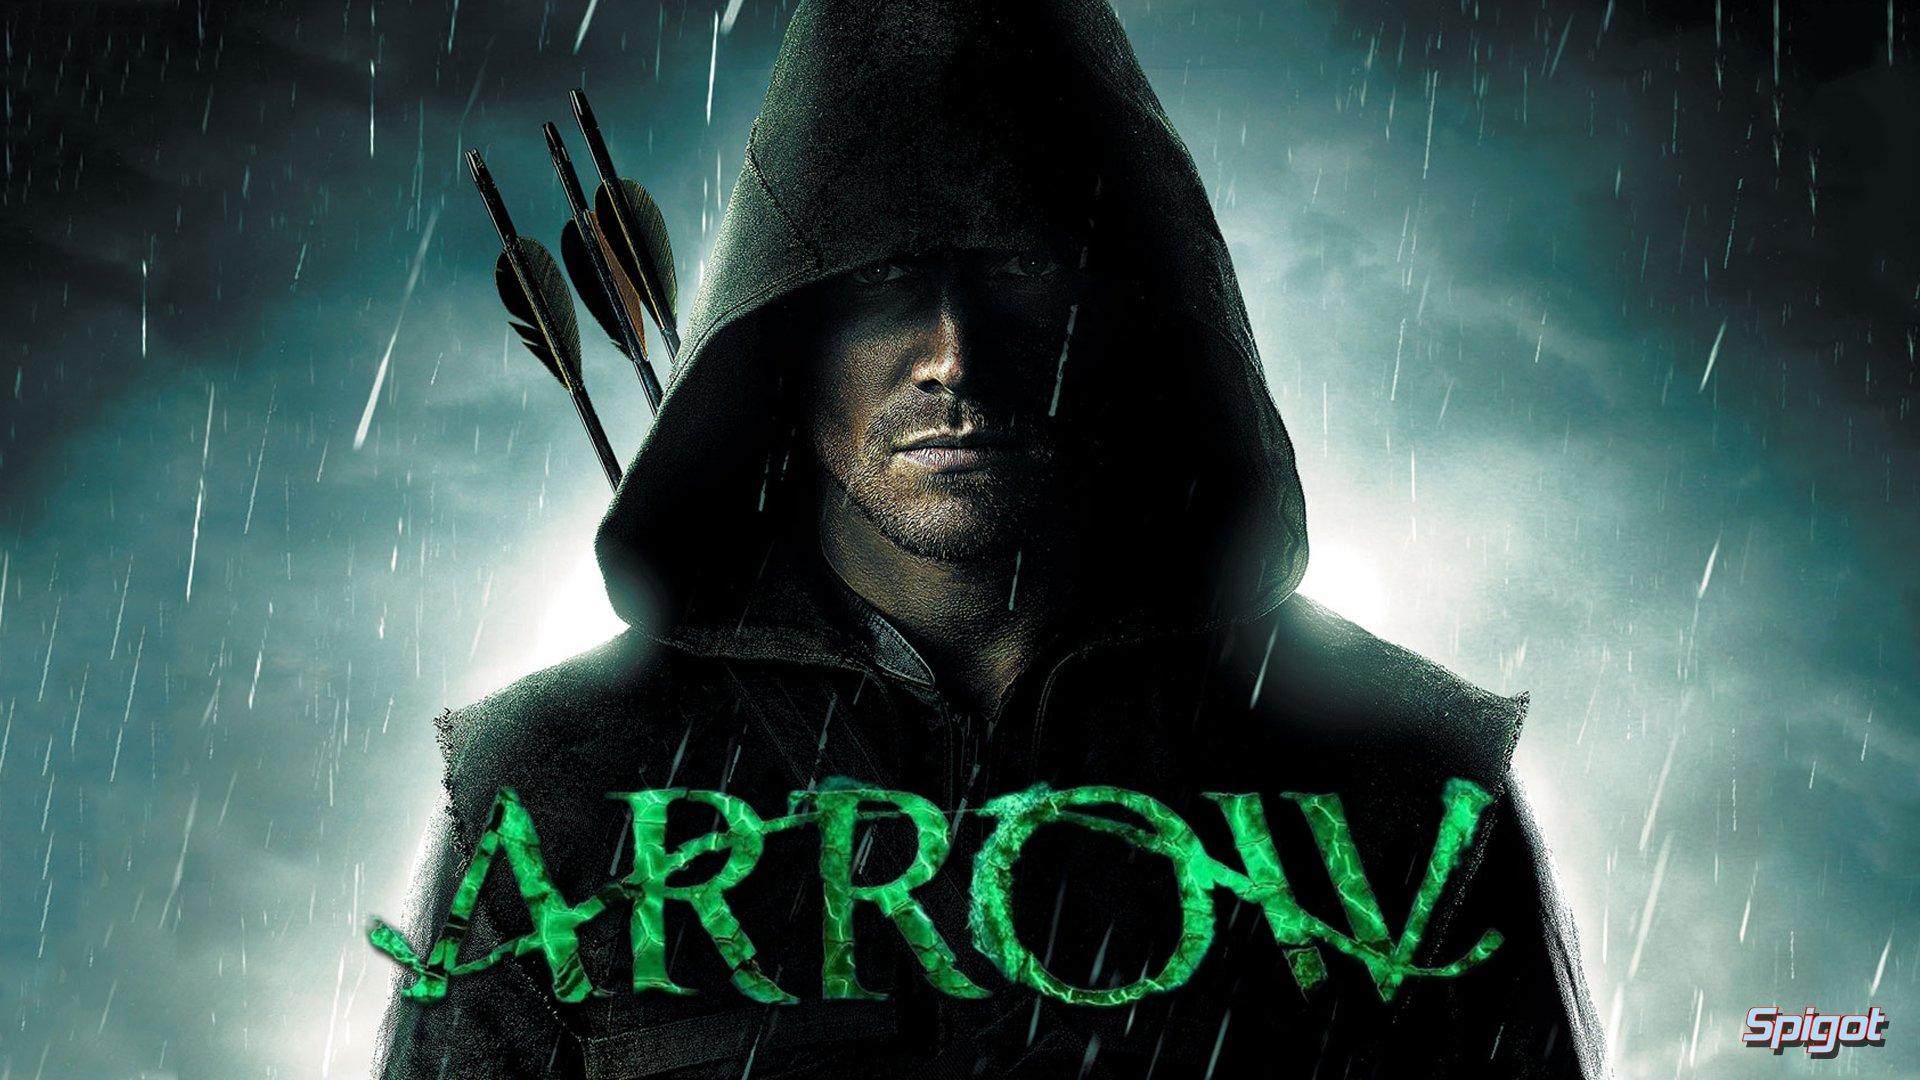 [49+] Green Arrow Wallpapers on WallpaperSafari